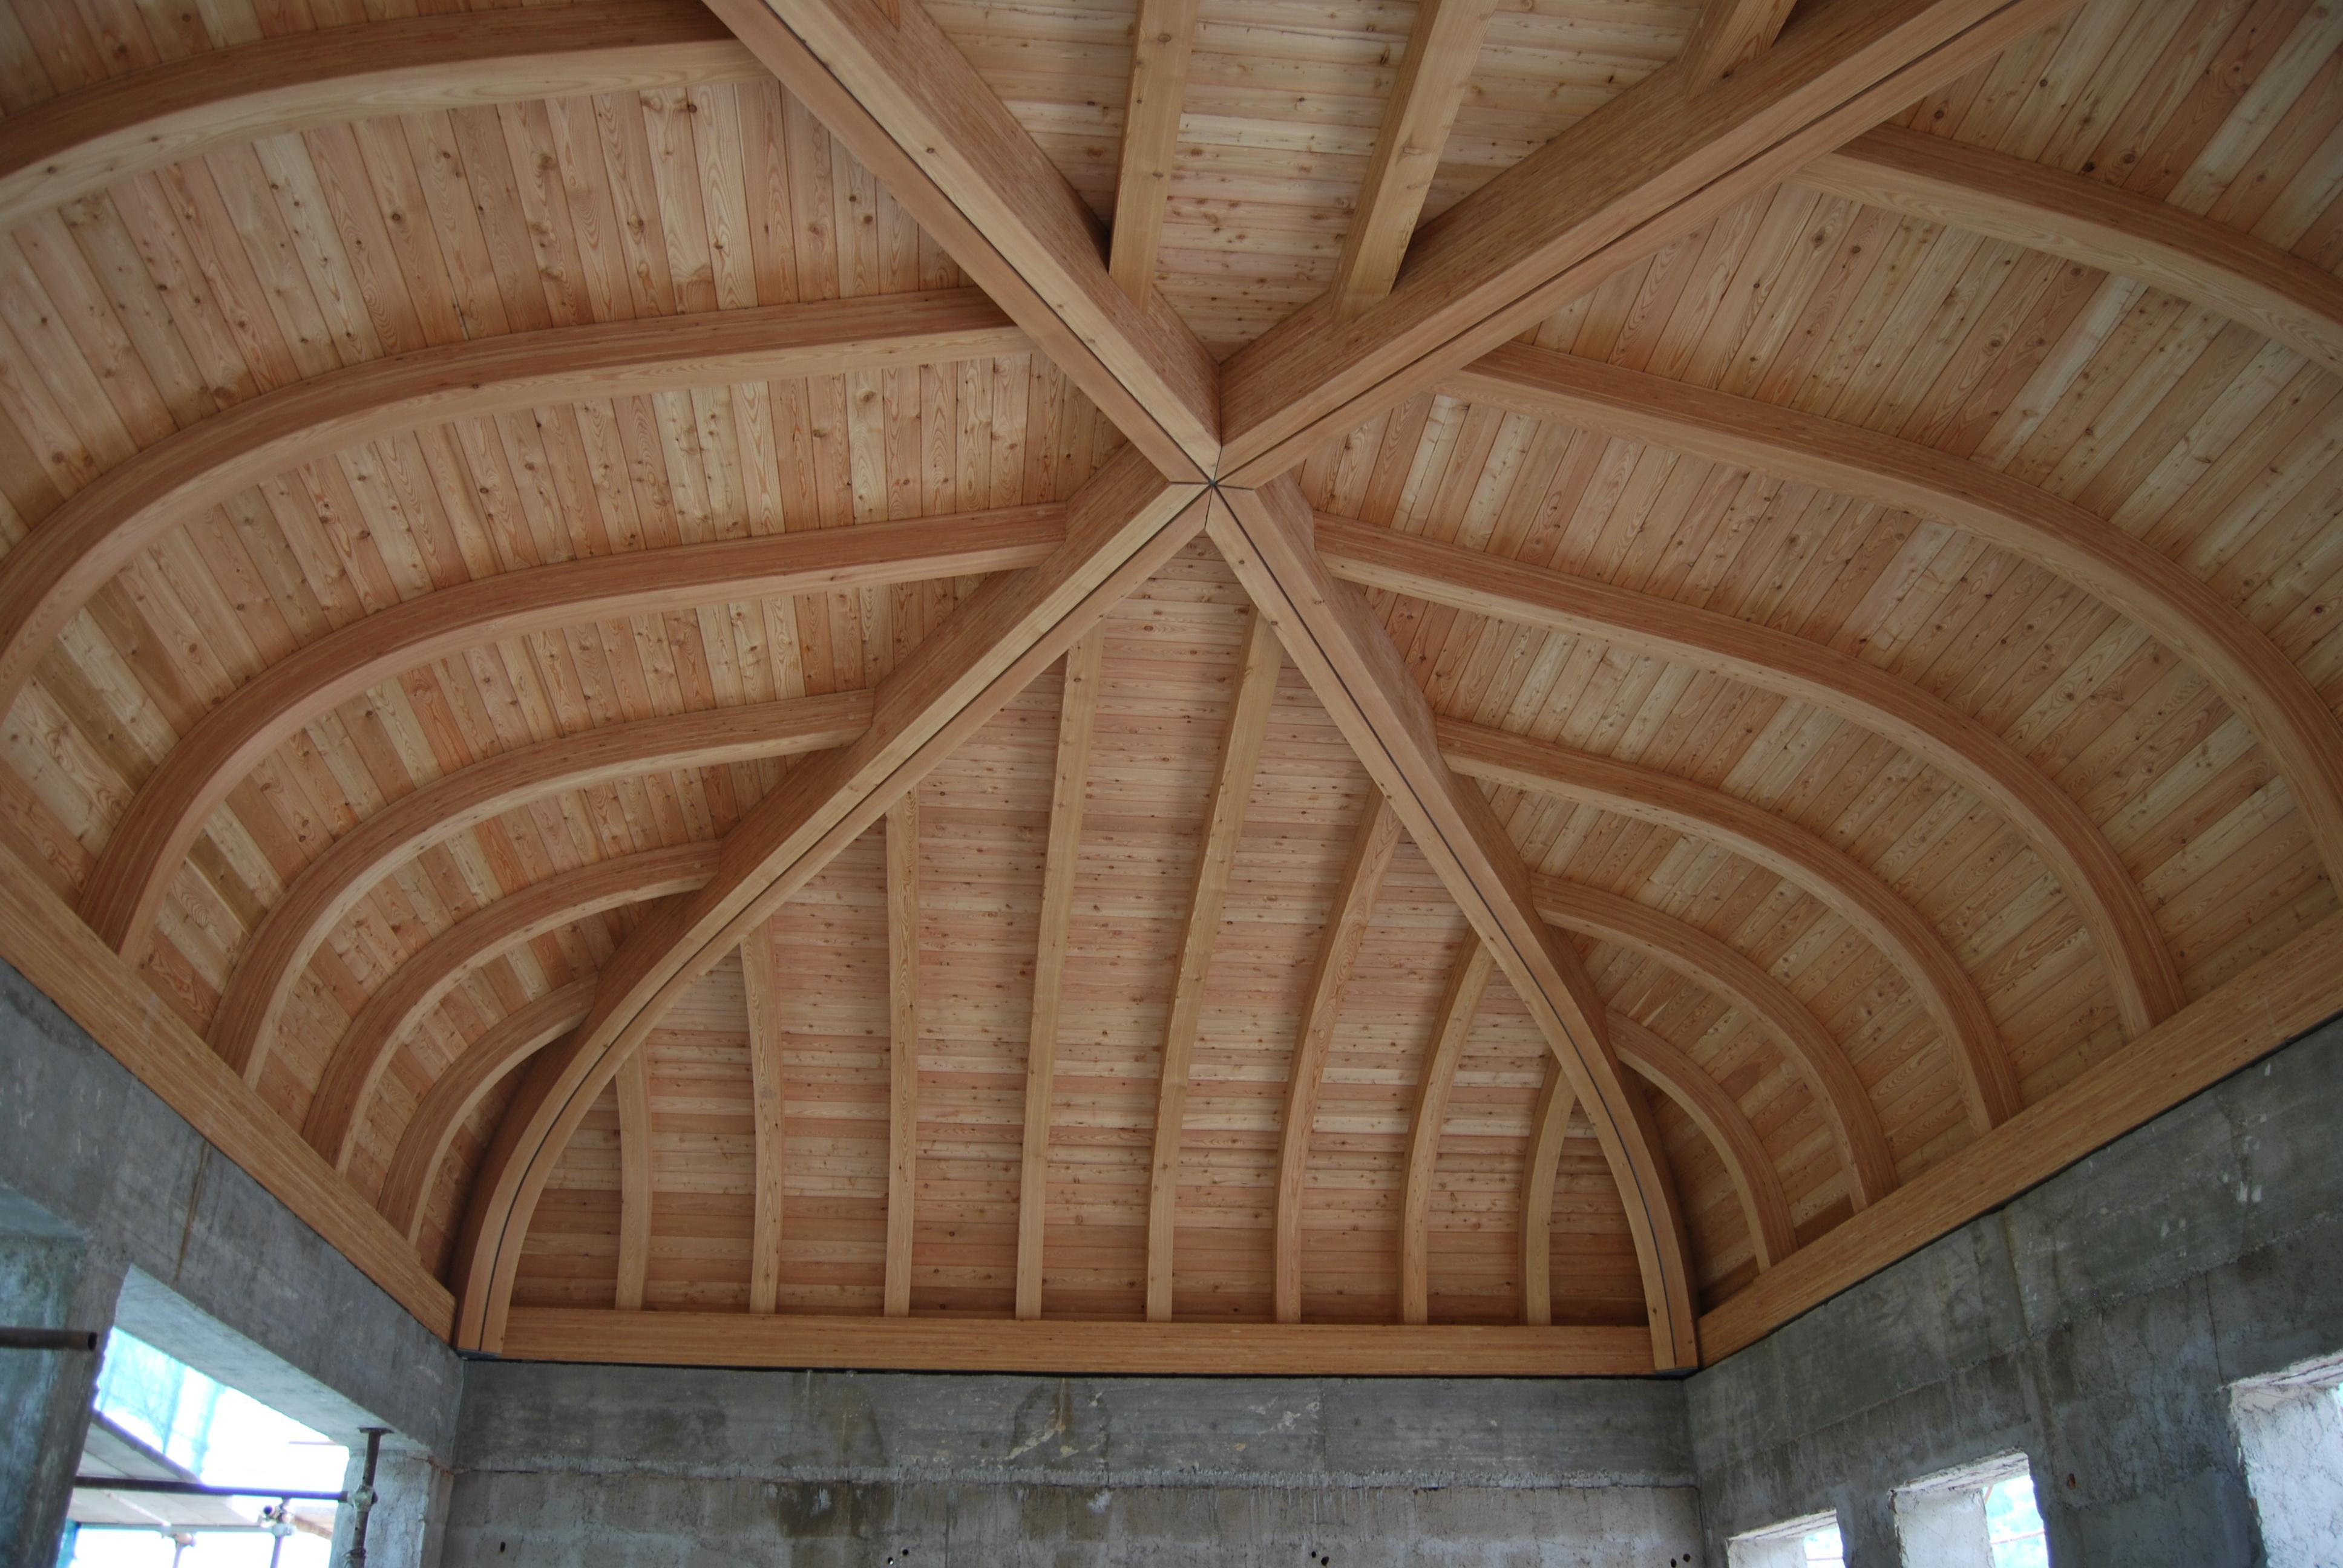 Curved Laminated Wood Beams ~ Glulam shaped curved beams vari tipi noble fir